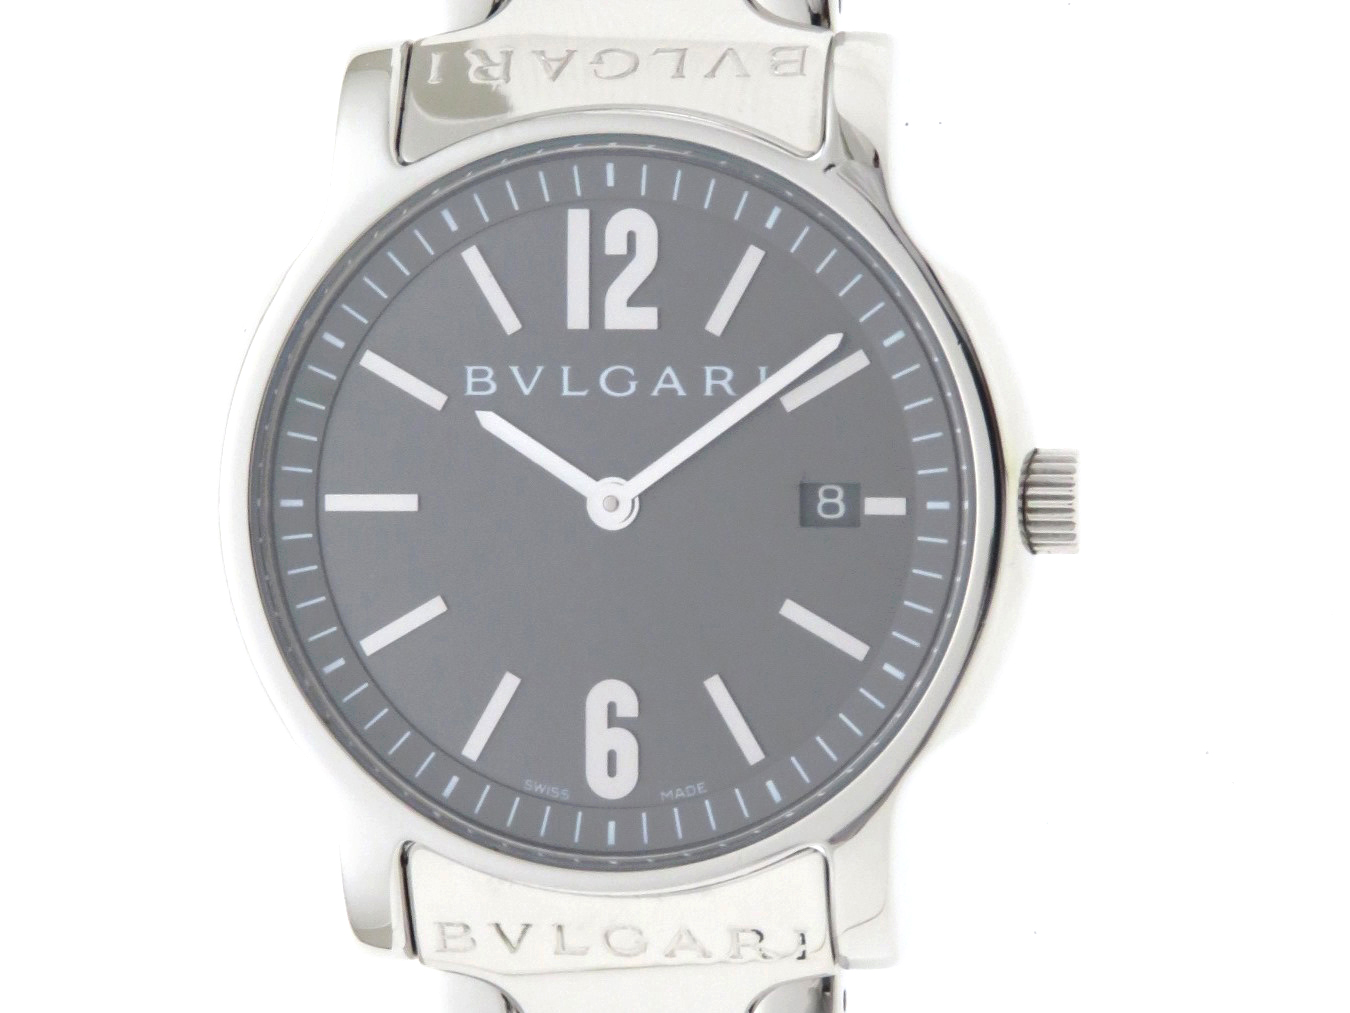 BVLGARI ブルガリ ソロテンポ クォーツ メンズ ST35S 【432】